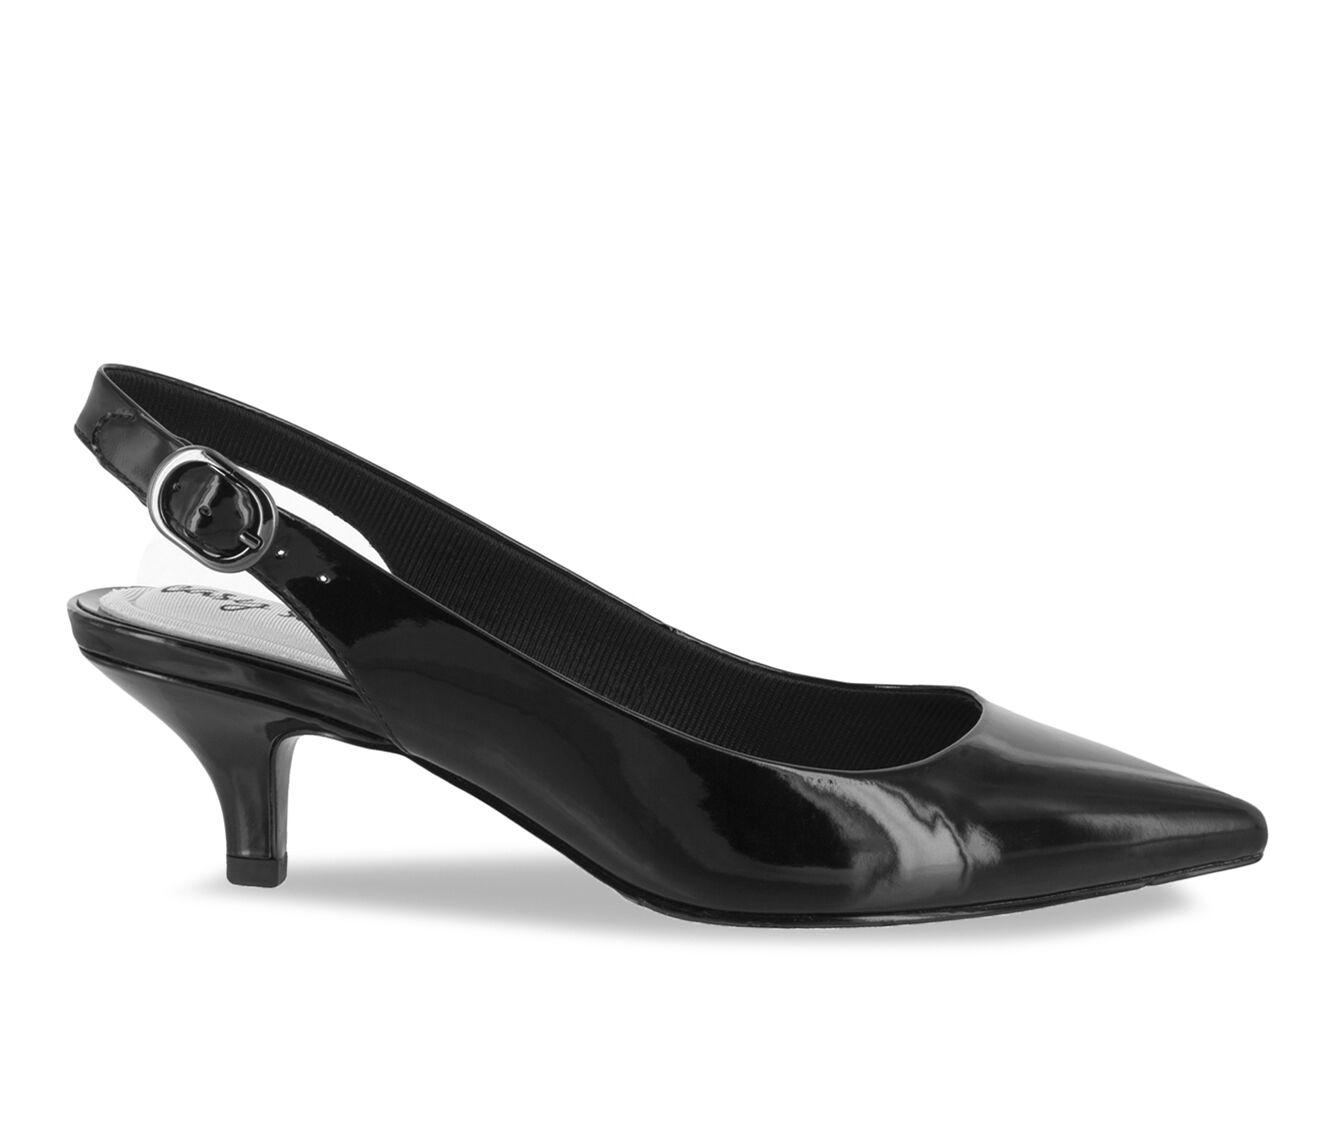 uk shoes_kd5742